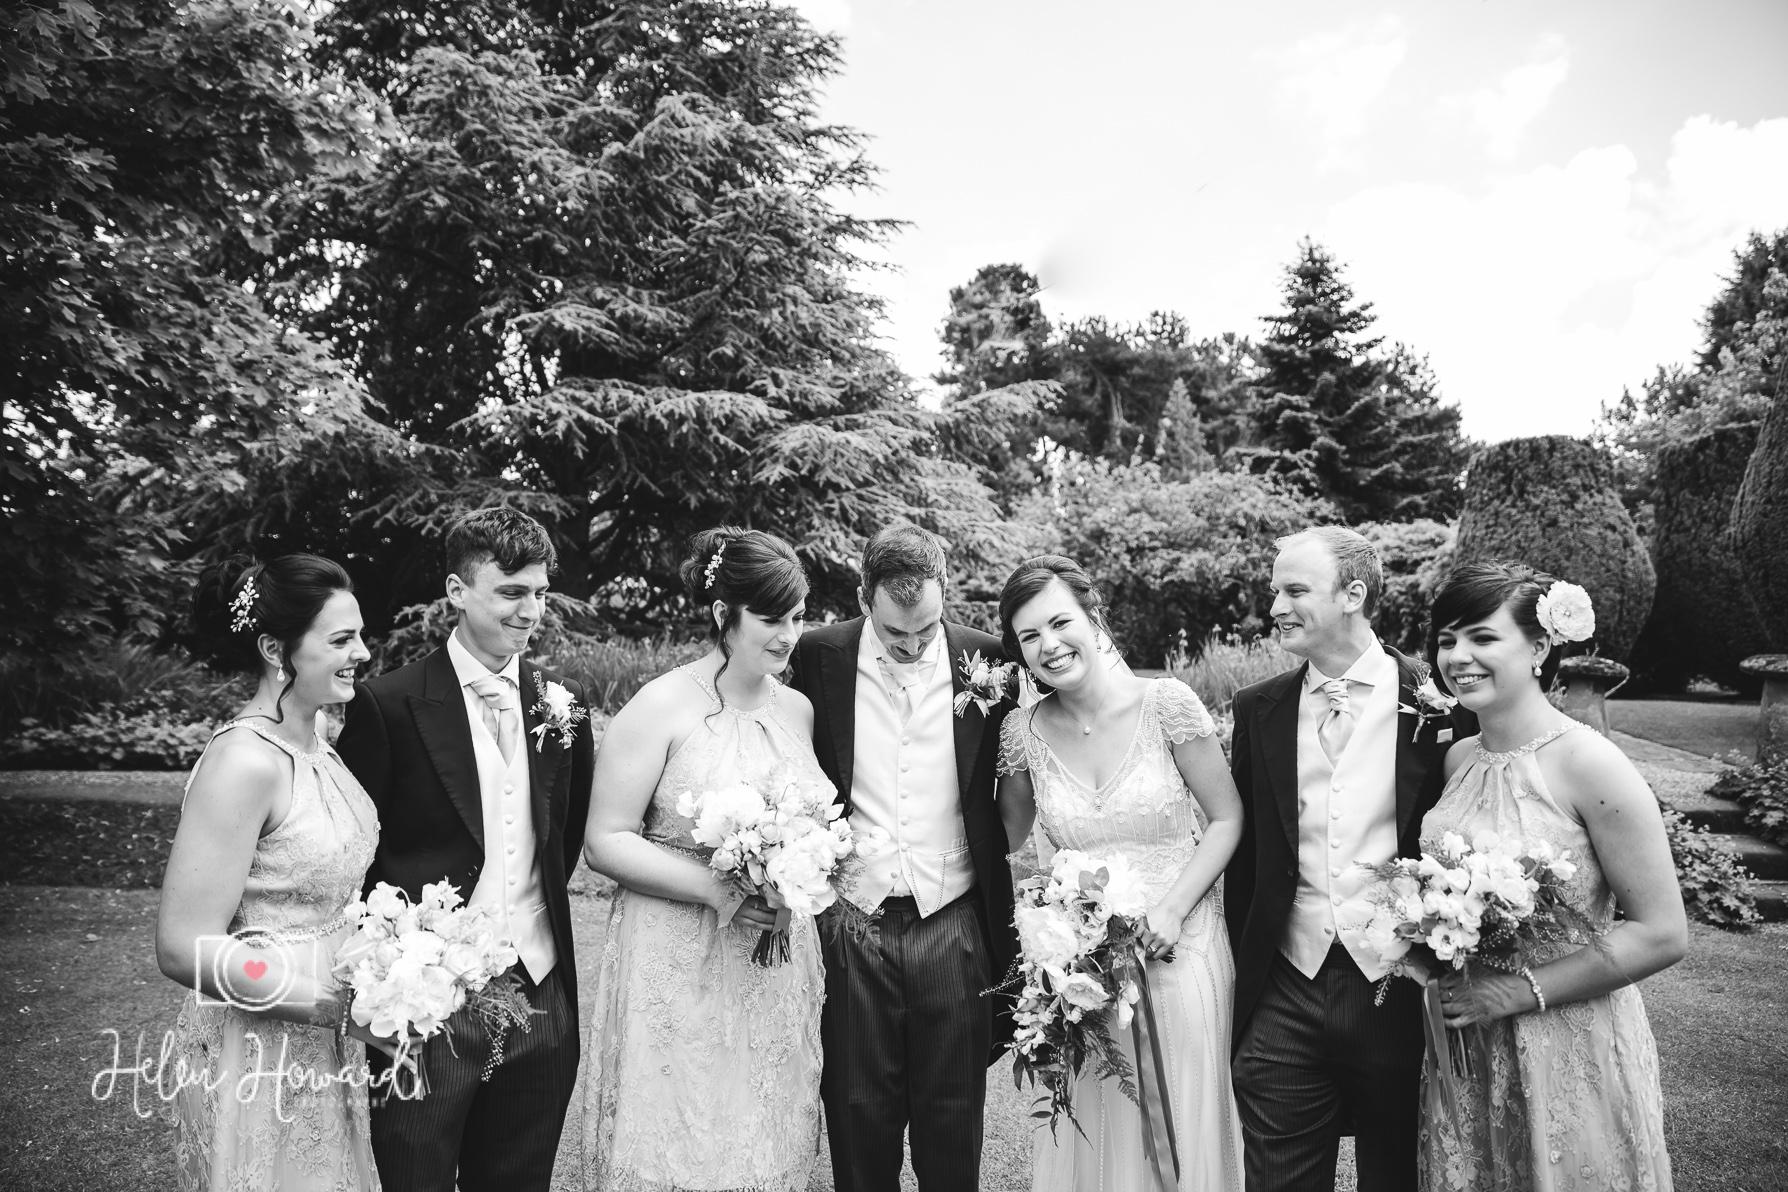 Helen Howard Photography Packington Moor Wedding-71.jpg